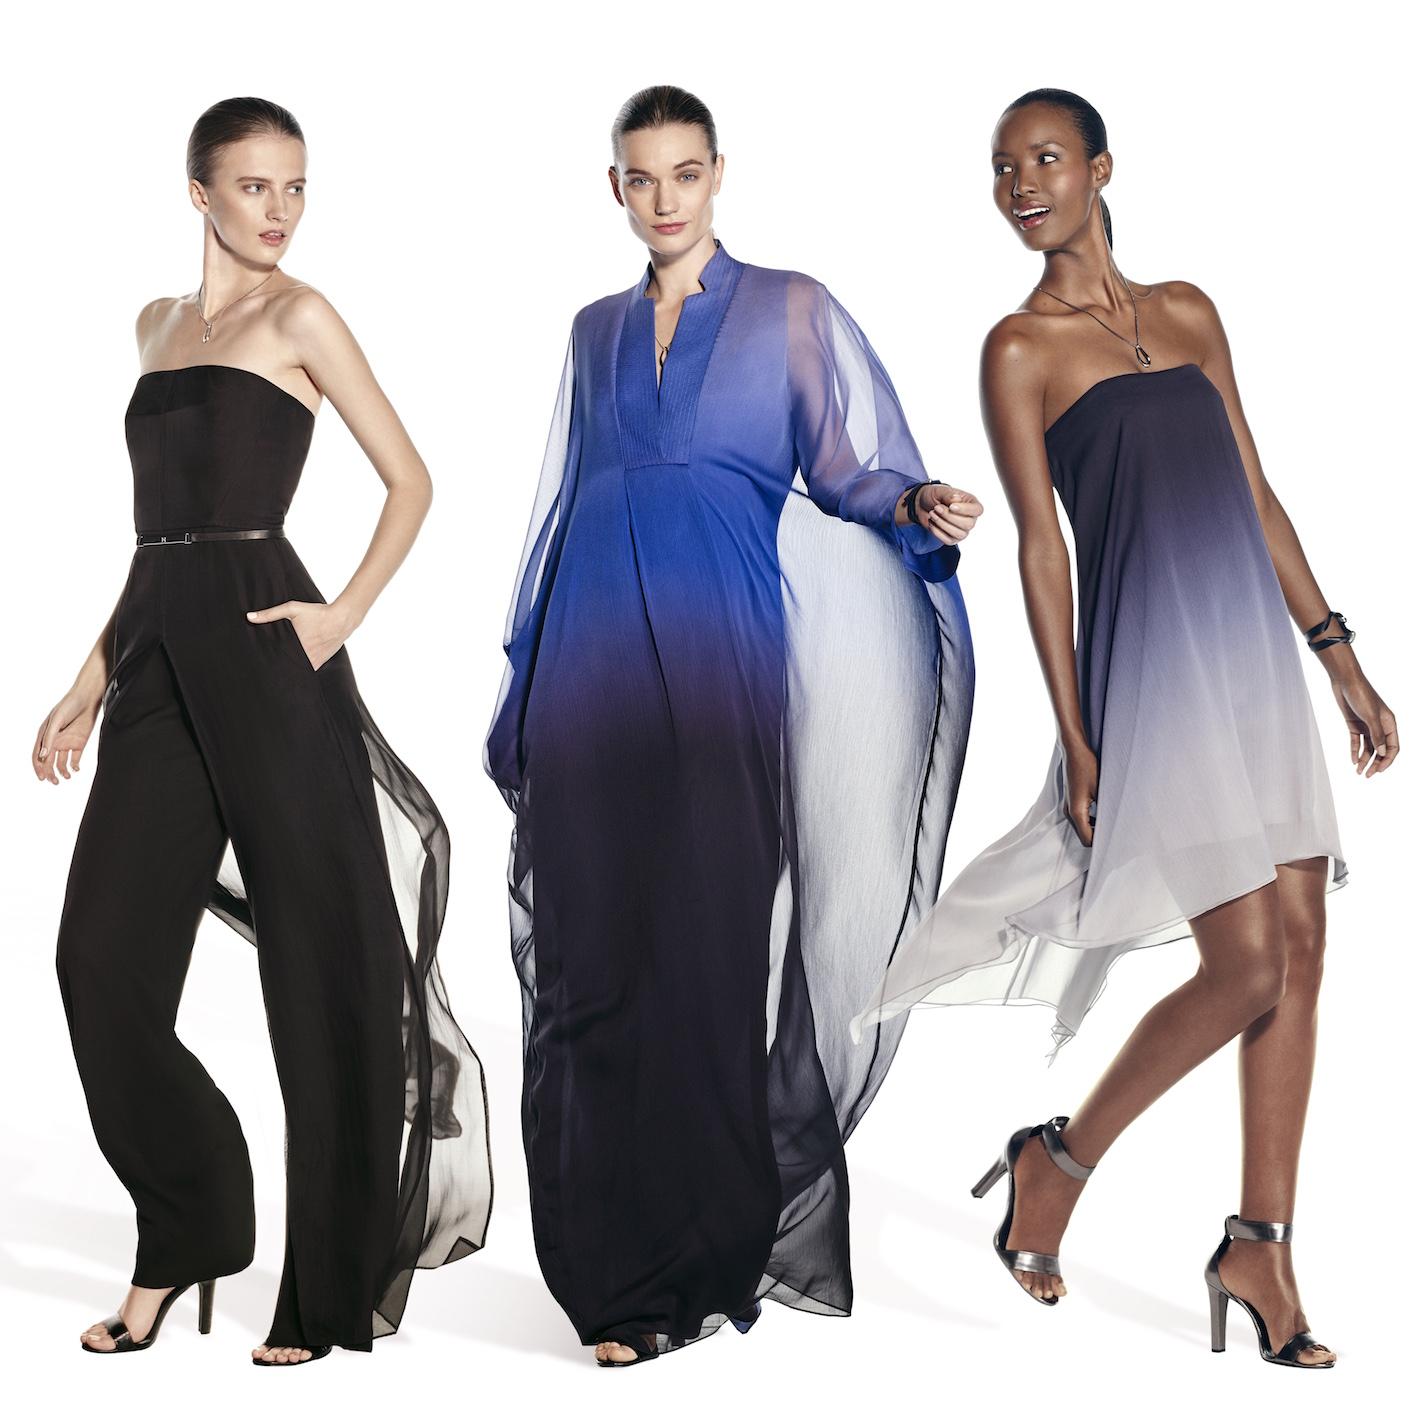 Lesley Frowick, Liza Minnelli - Halston: American Fashion6